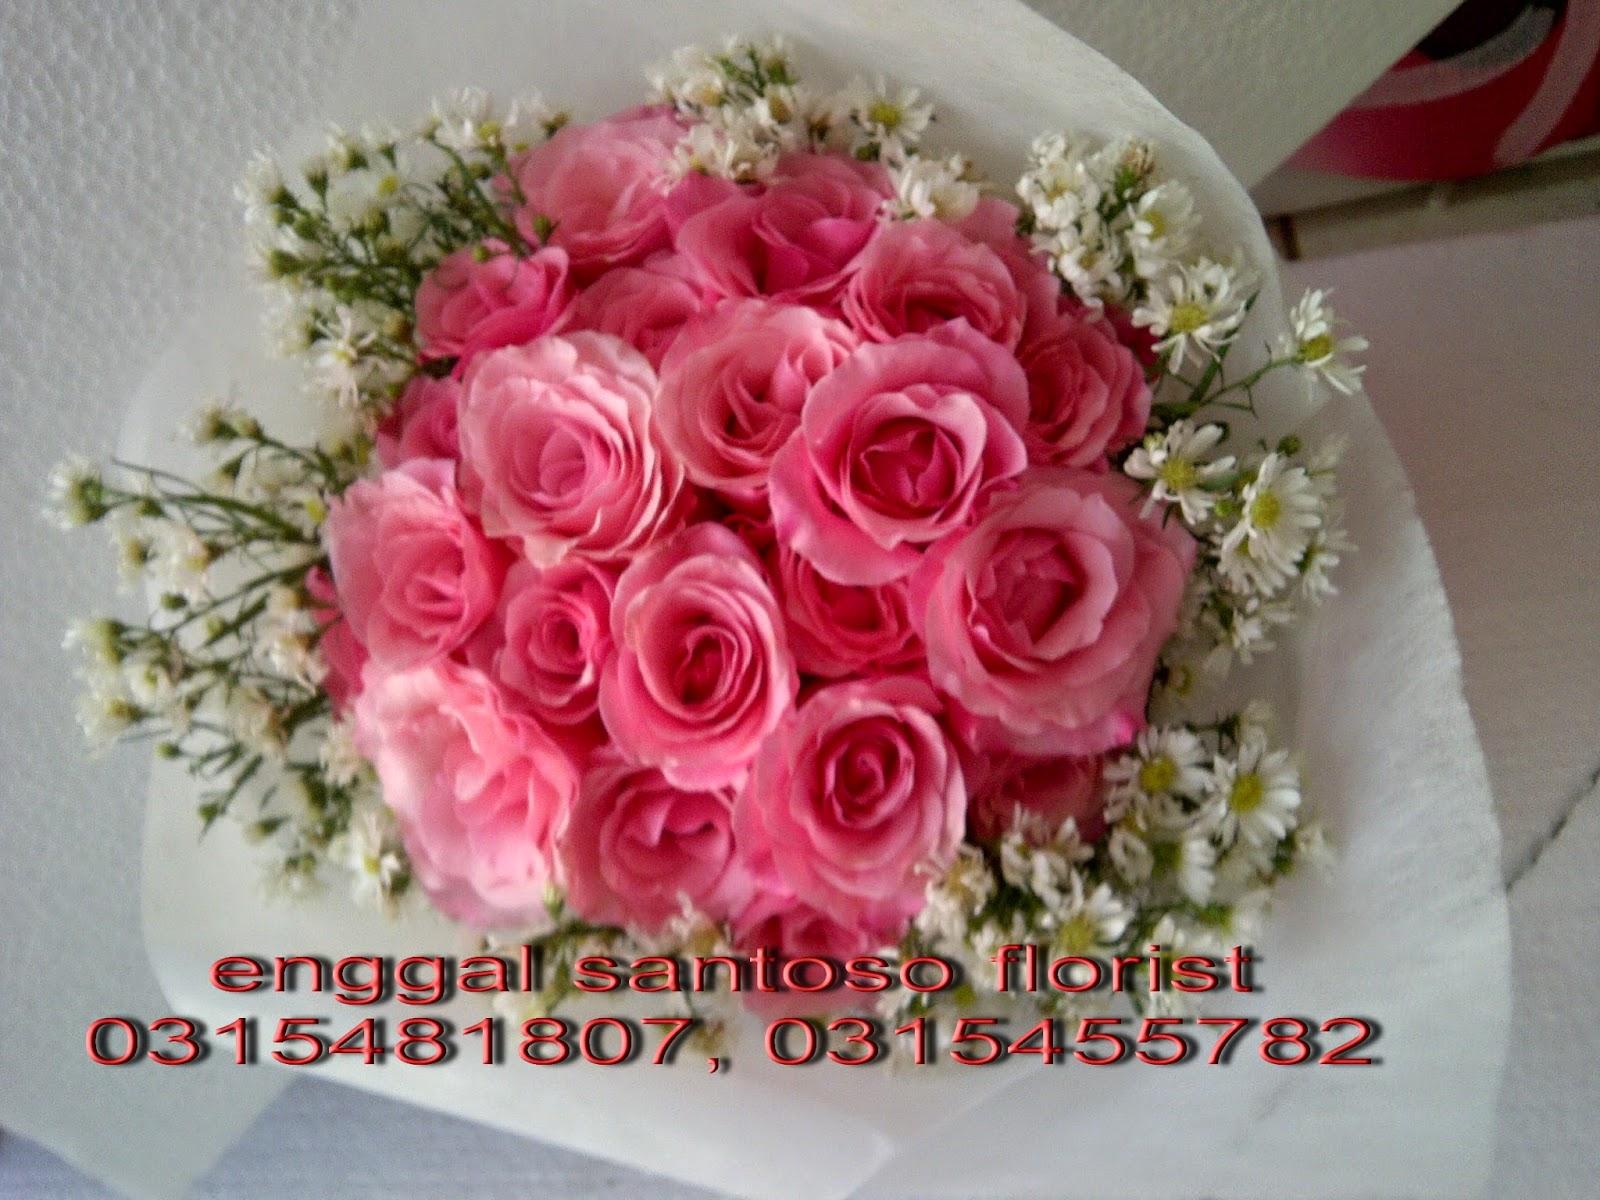 toko online rangkaian karangan bunga tangan surabaya